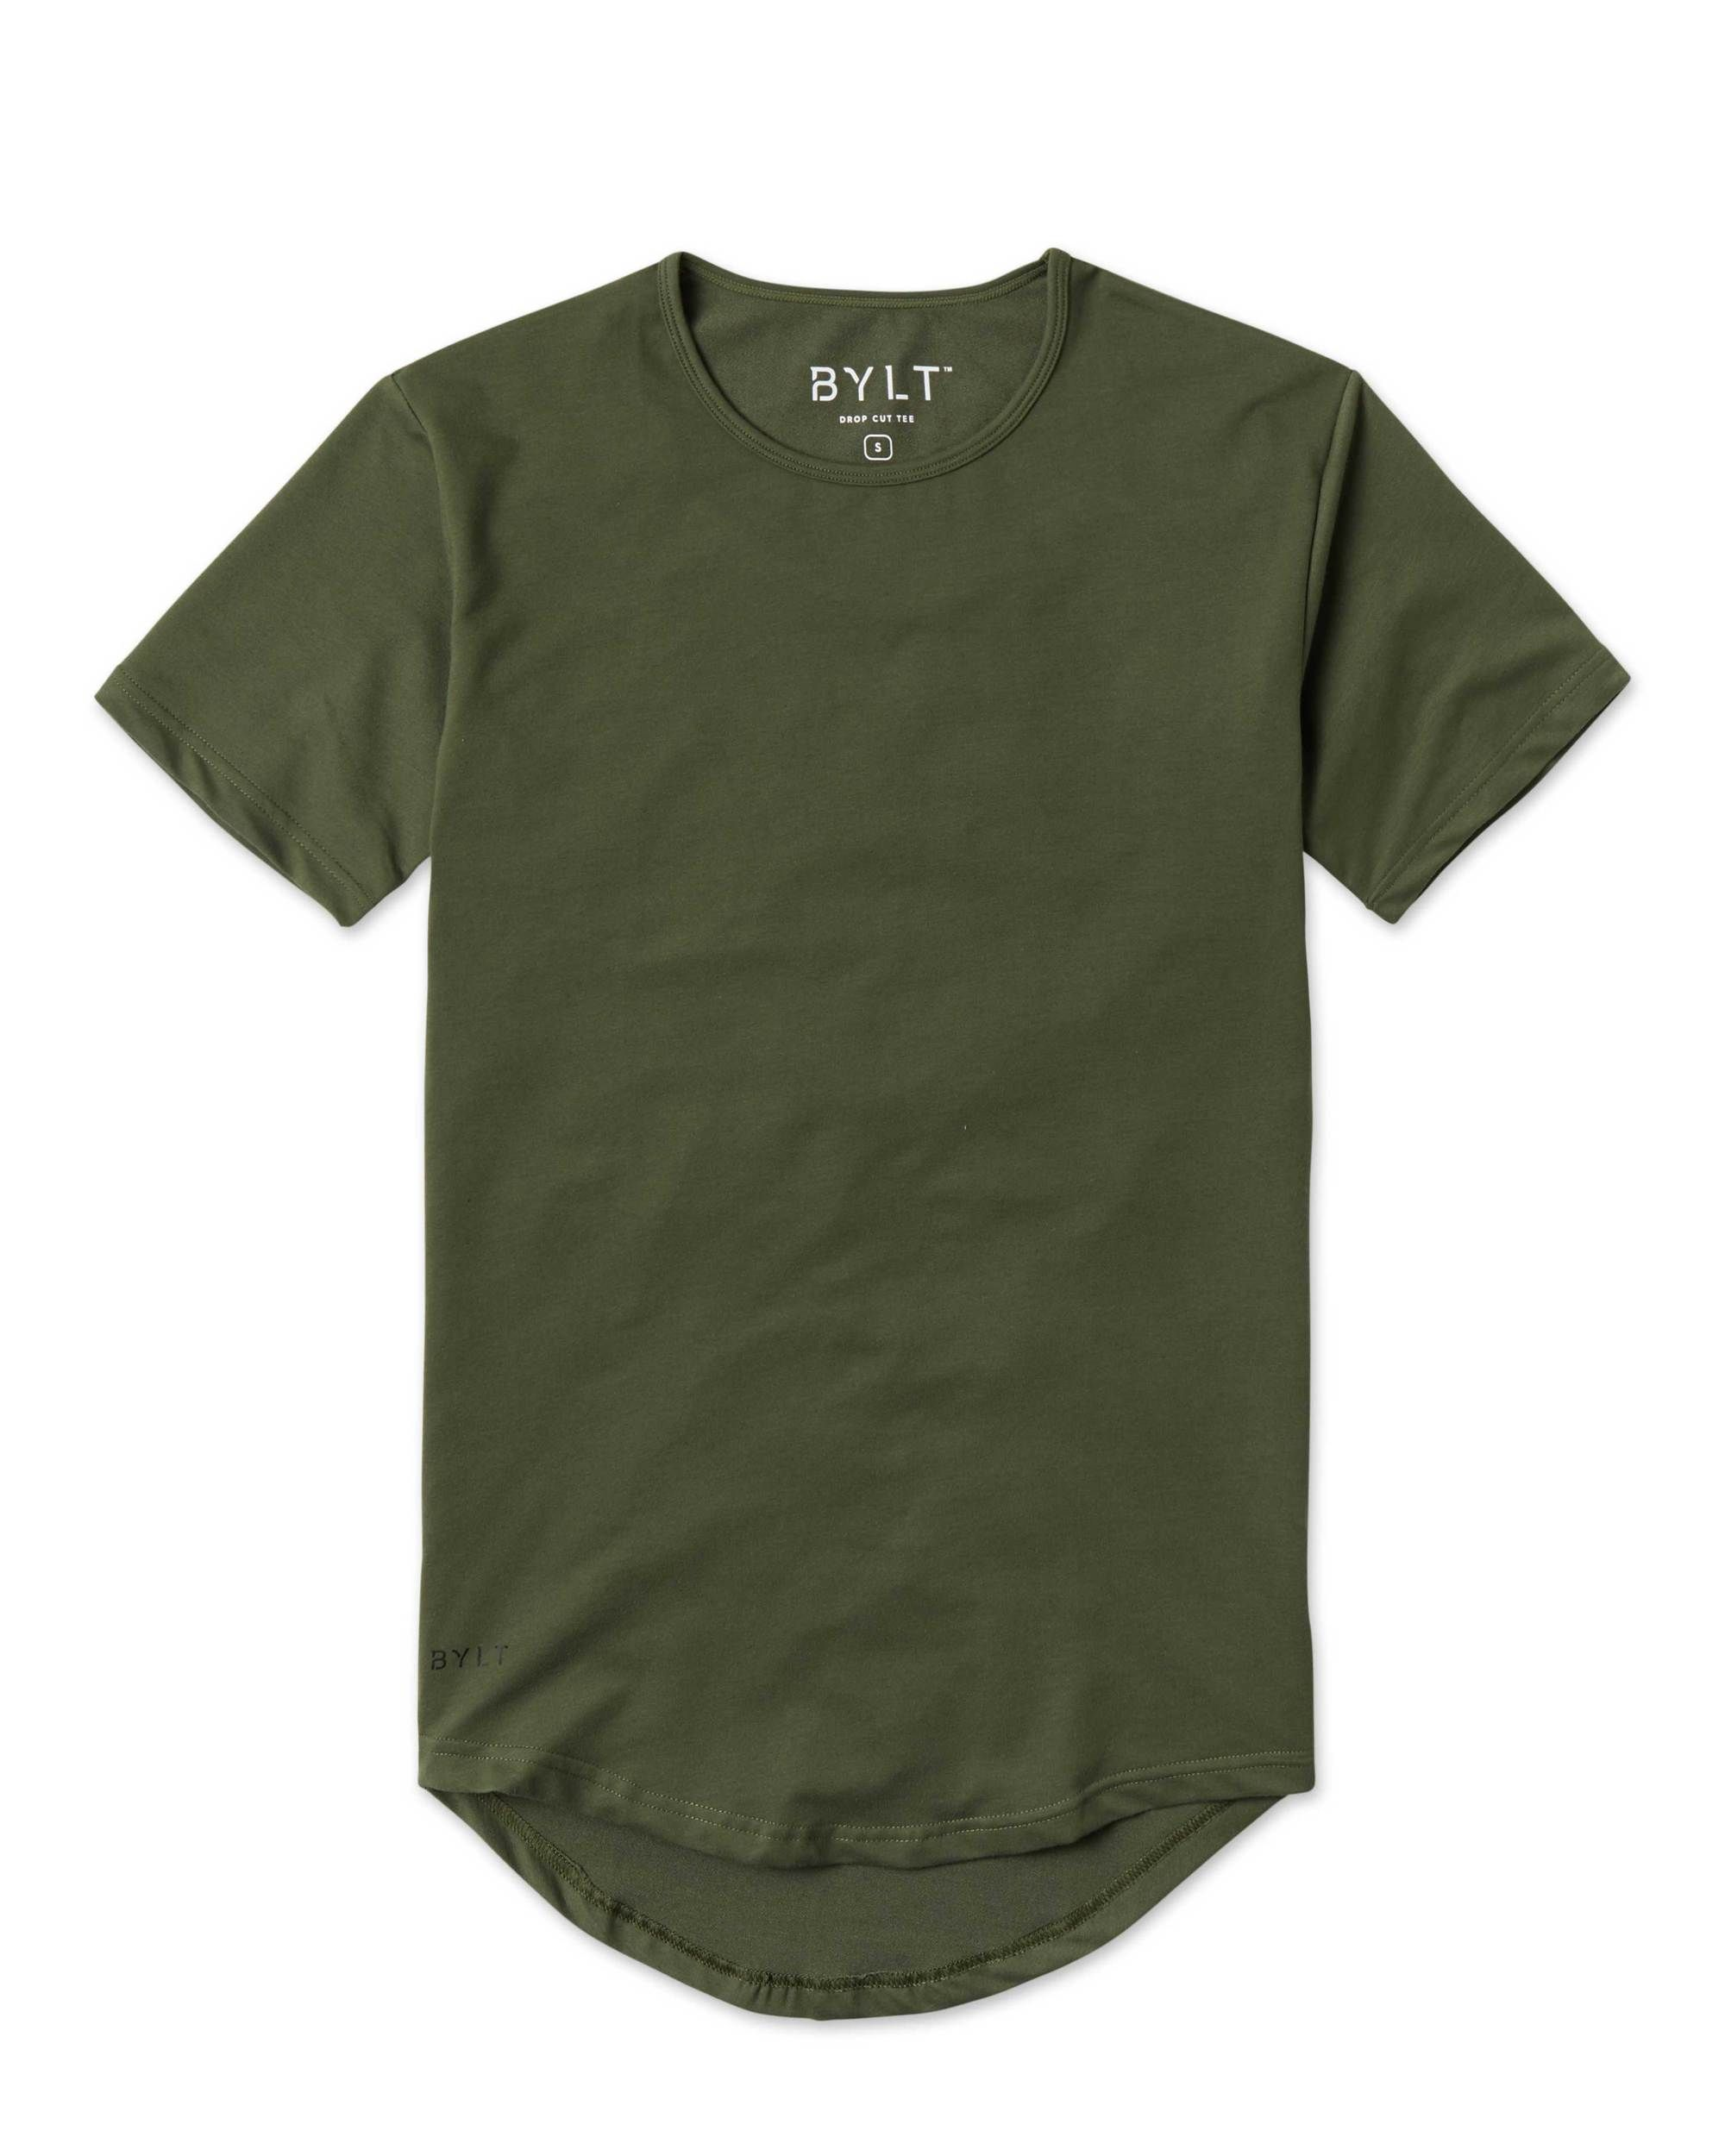 76ca6f92 Men's Drop-Cut T-Shirts by BYLT Basics were elegantly designed to be worn